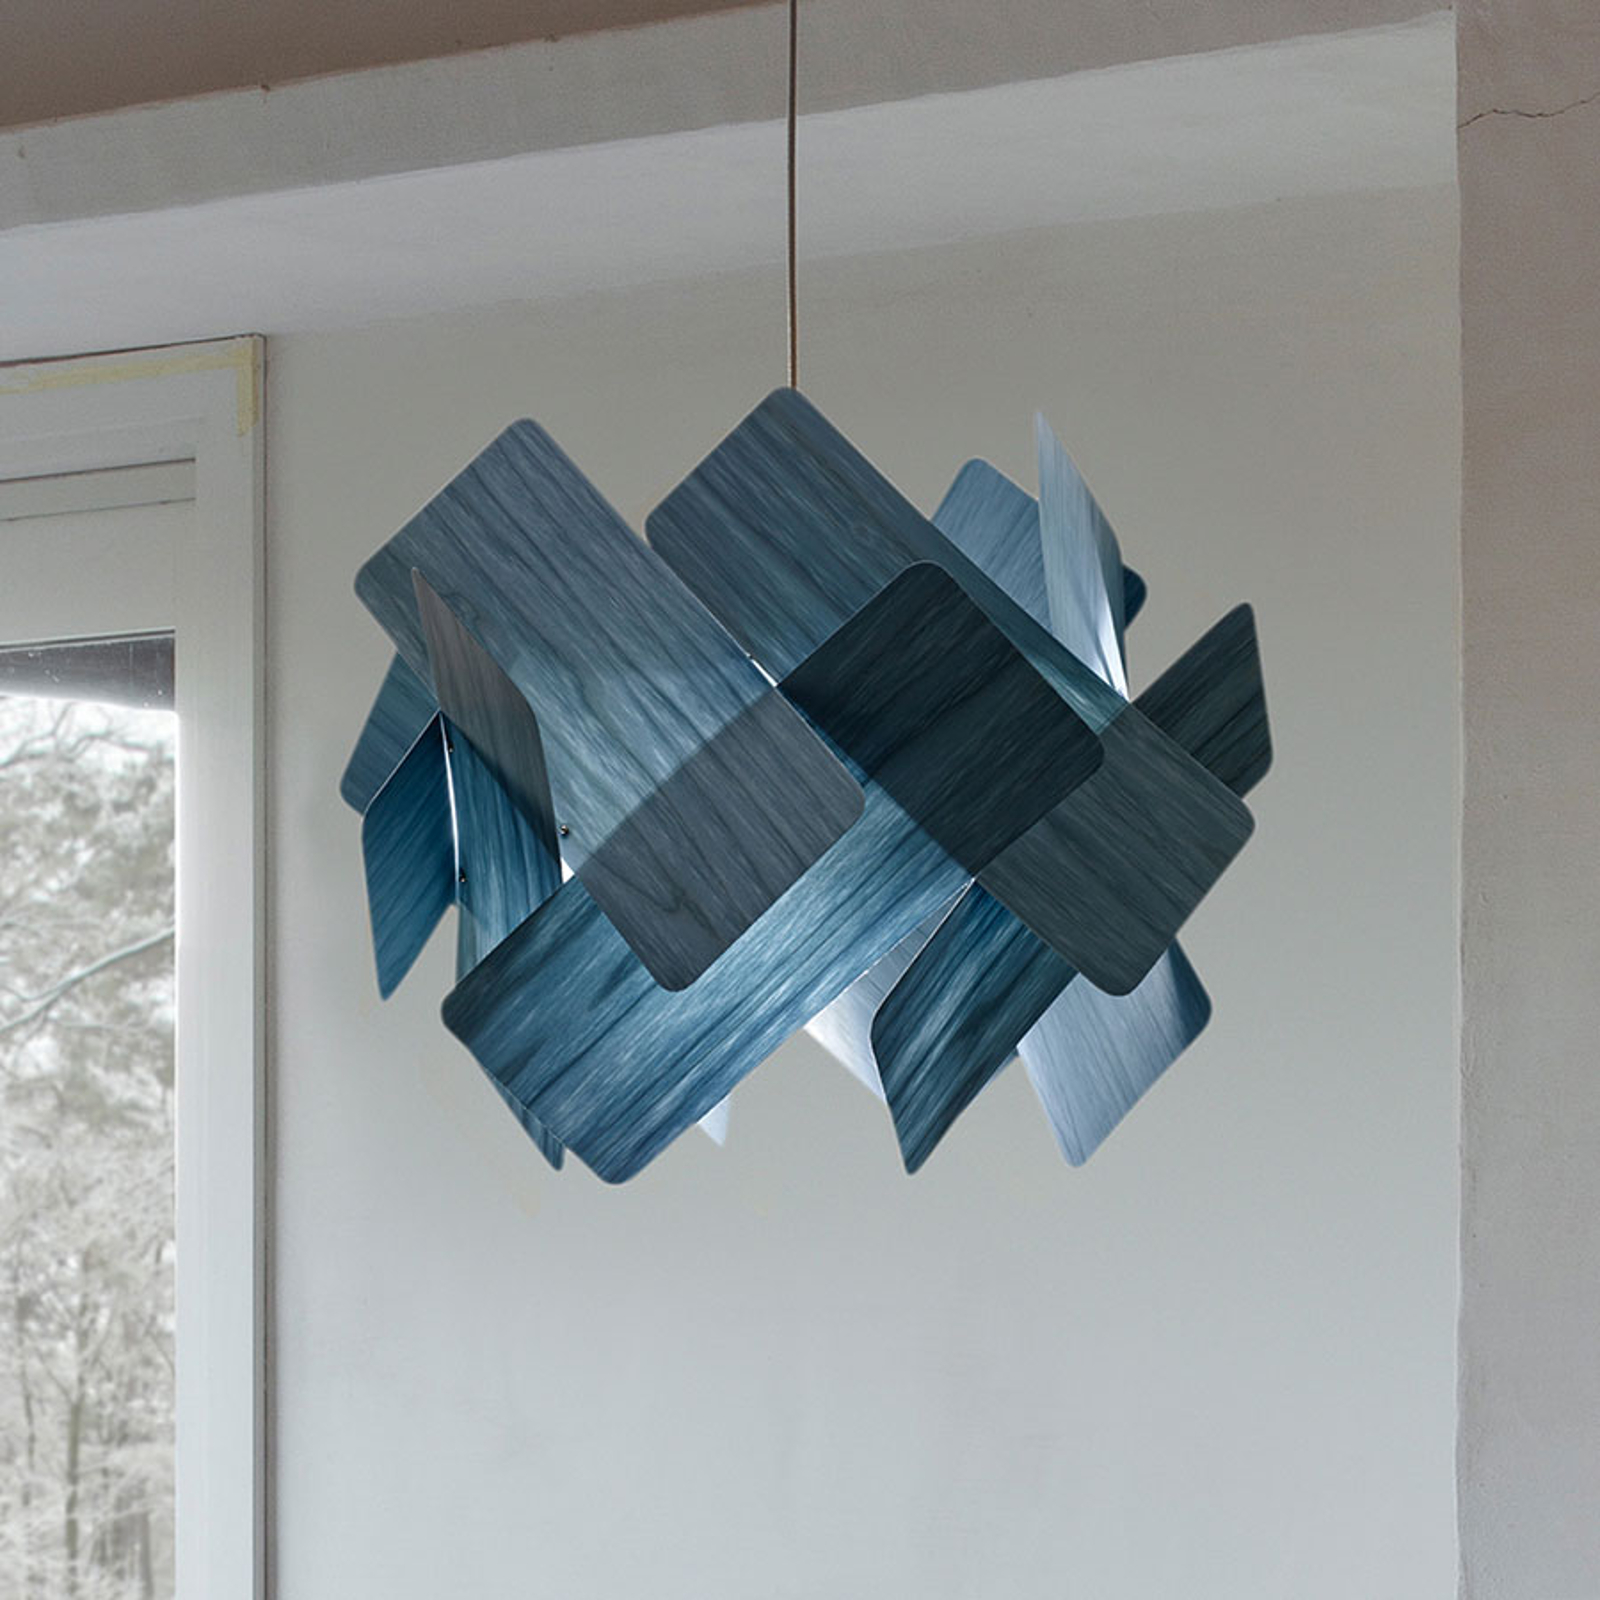 LZF Escape hengelampe, Ø 30 cm, blå